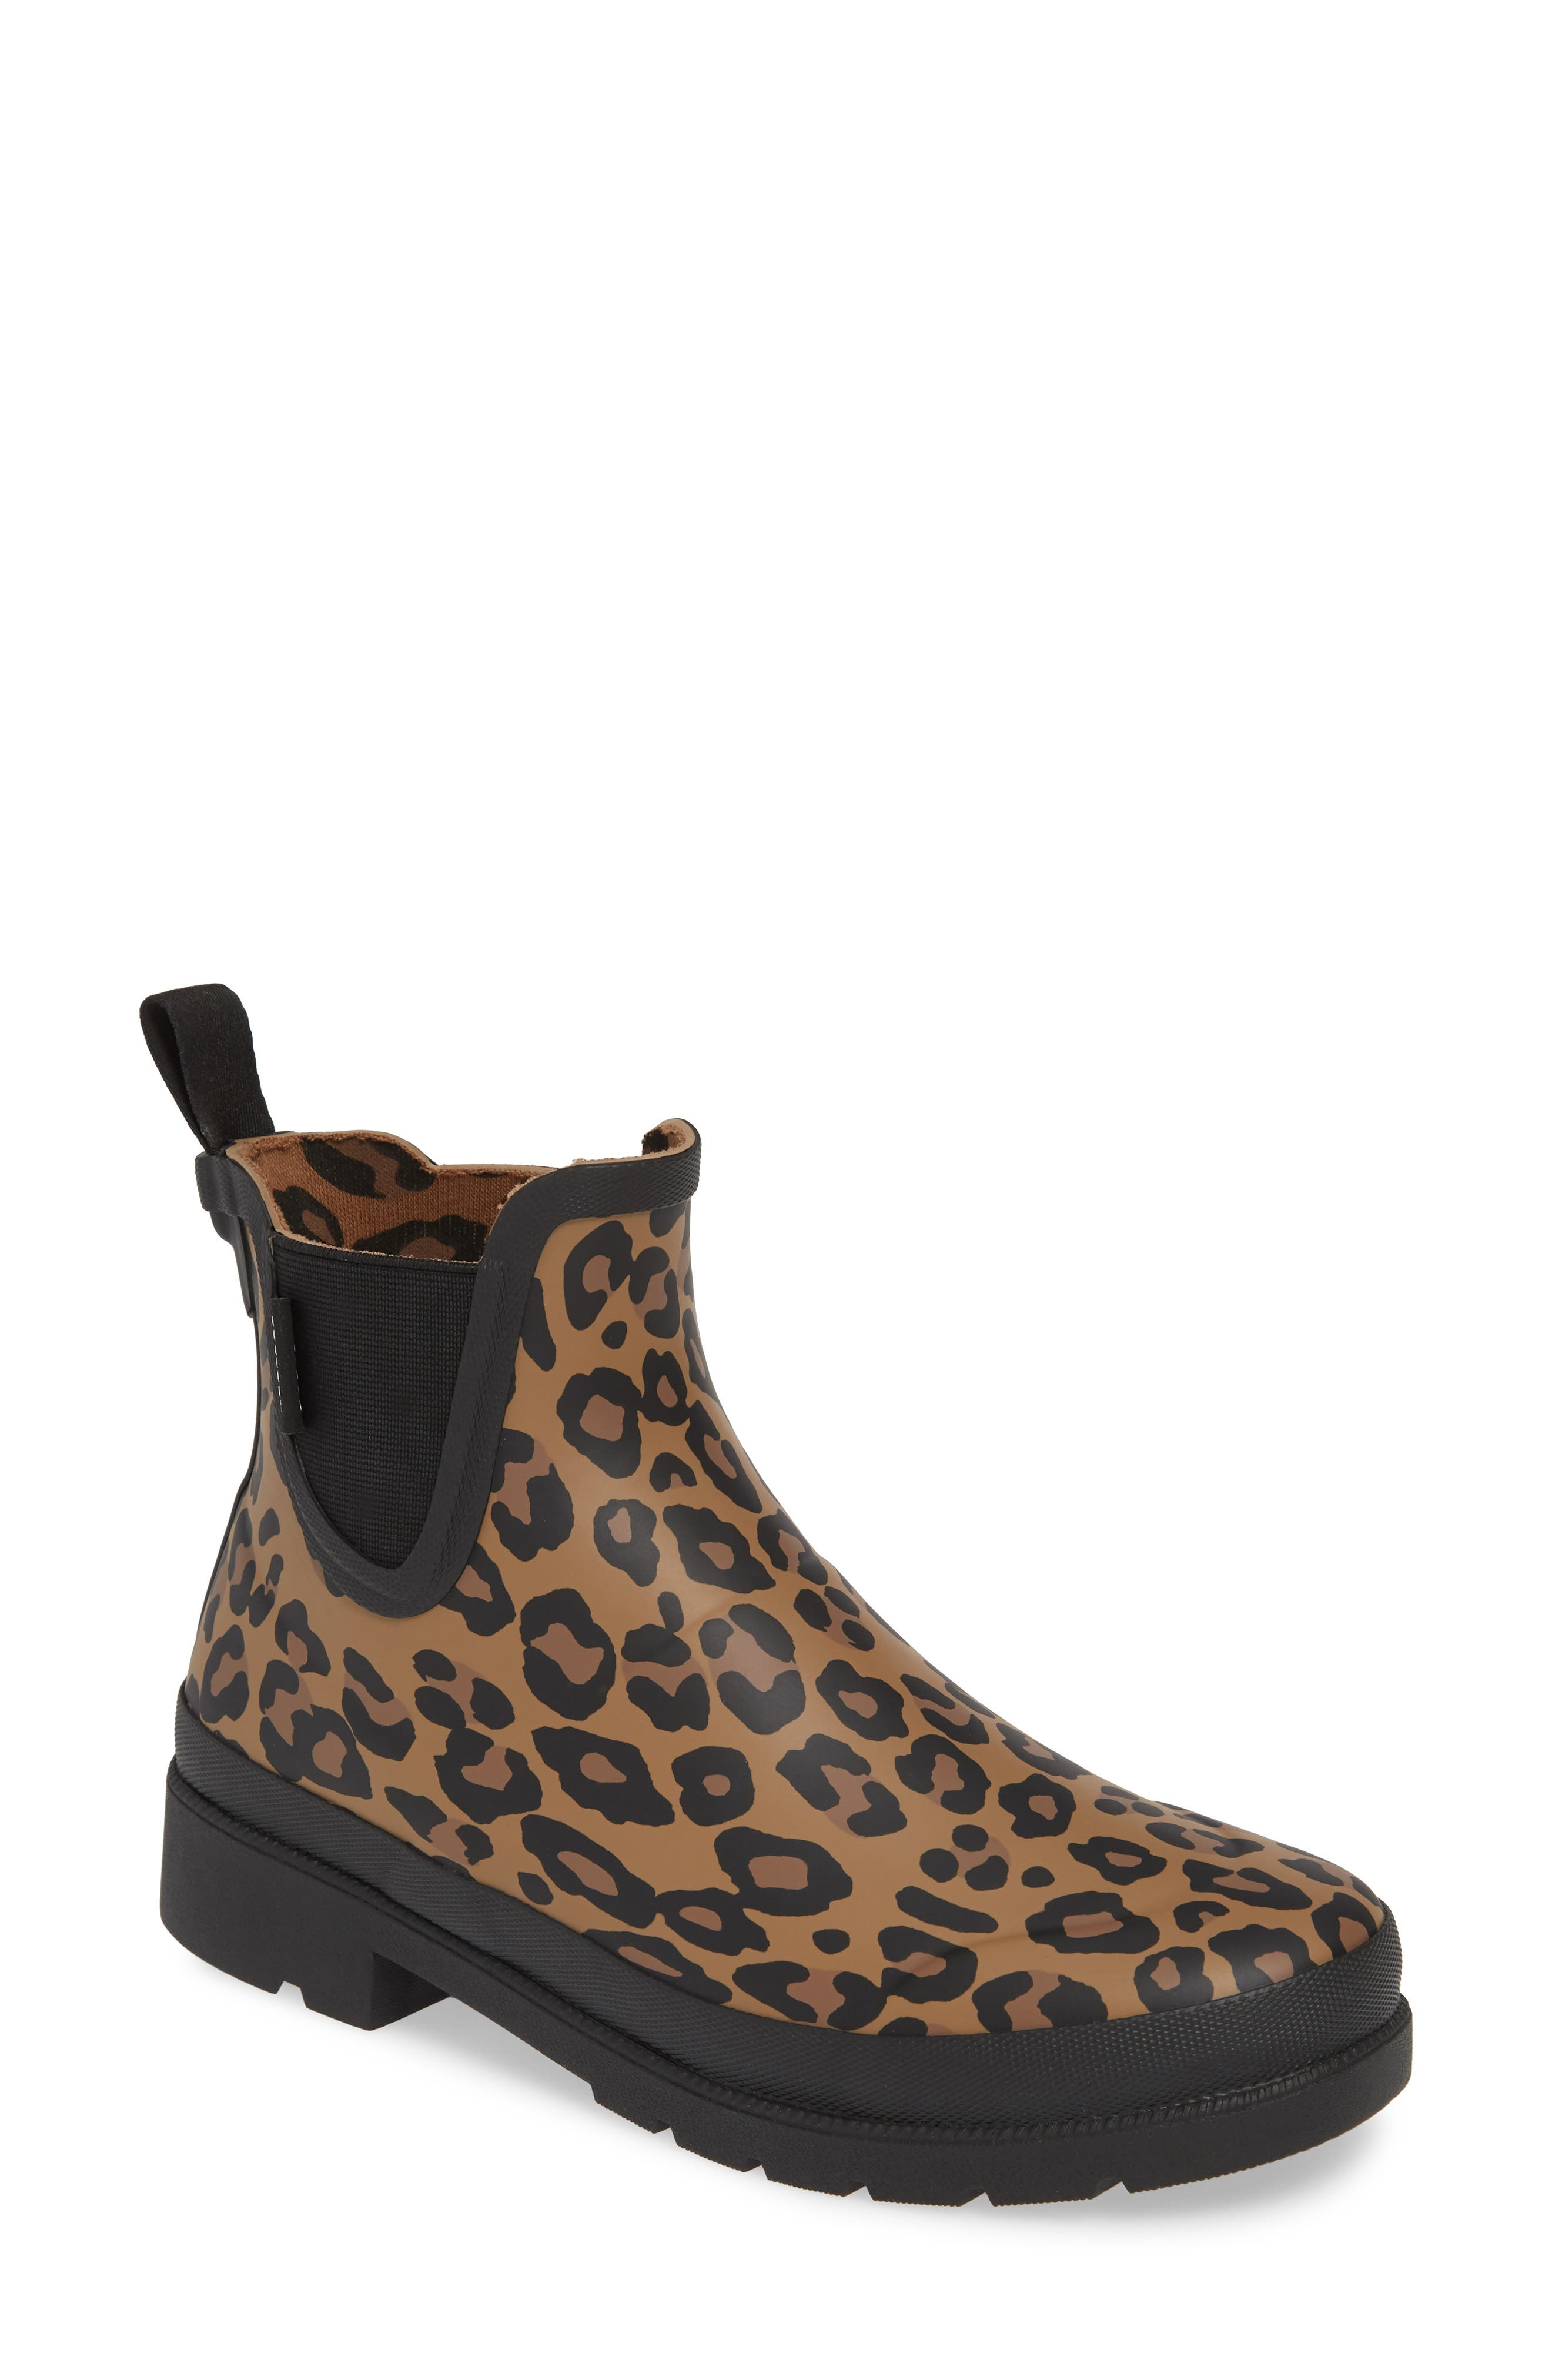 Tretorn Lina 2 Waterproof Chelsea Rain Boot, Black